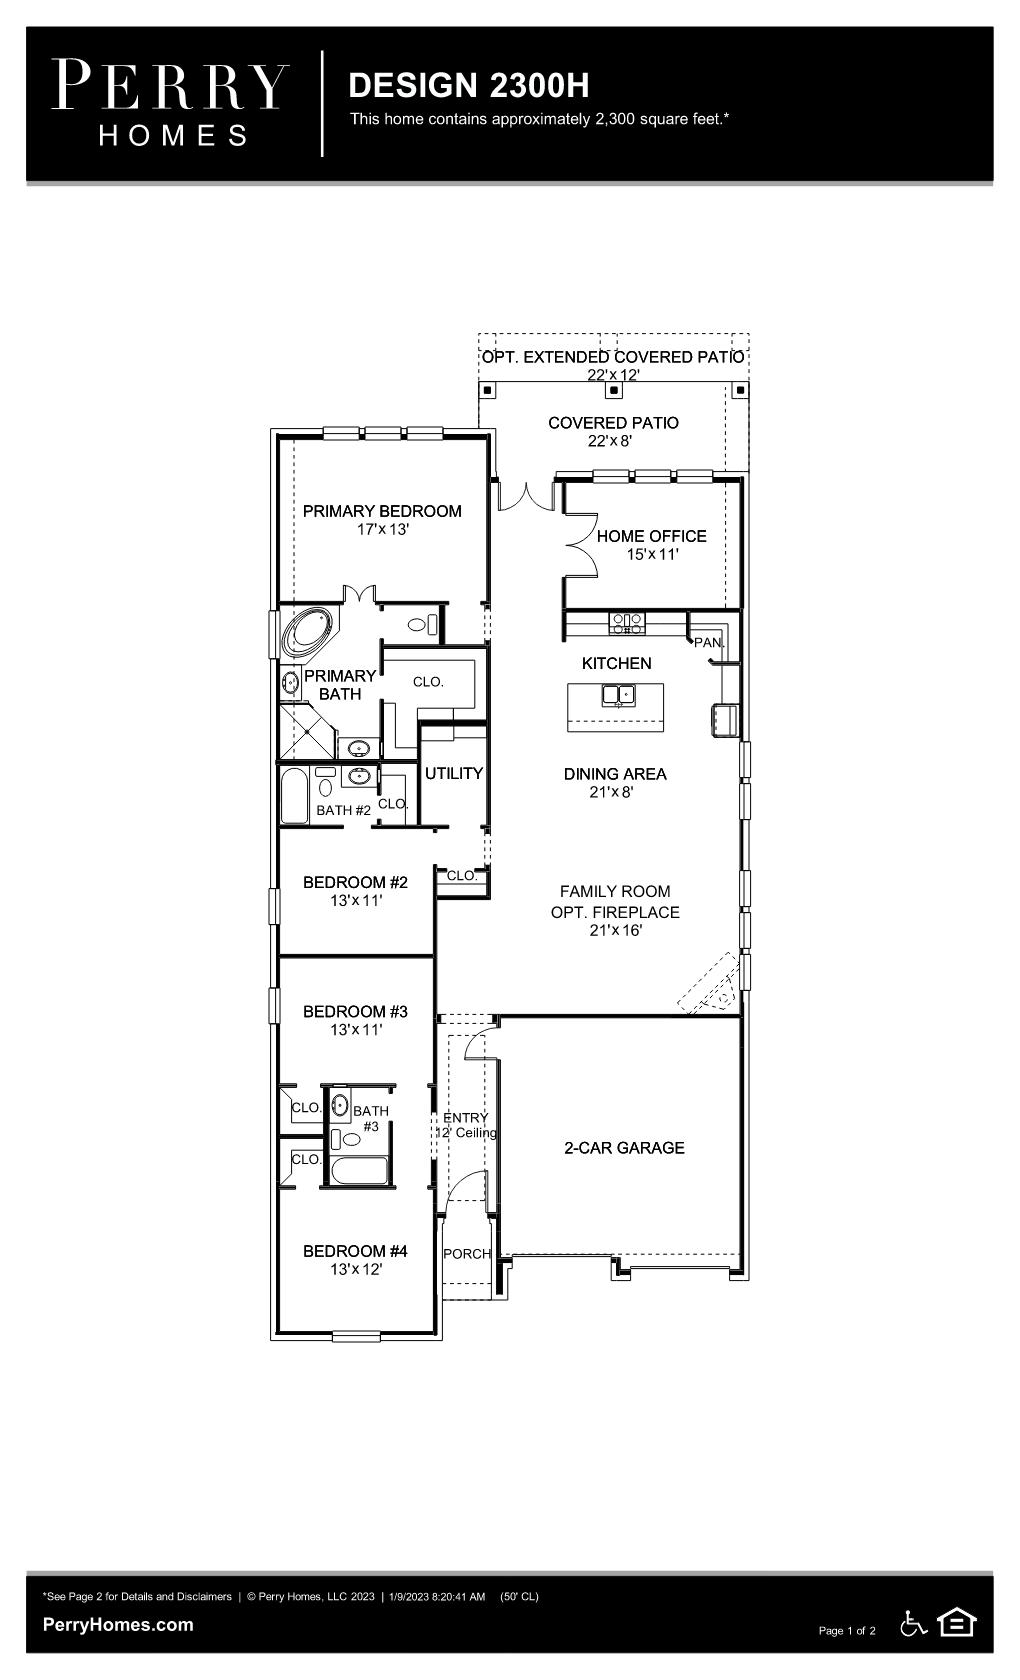 Floor Plan for 2300H